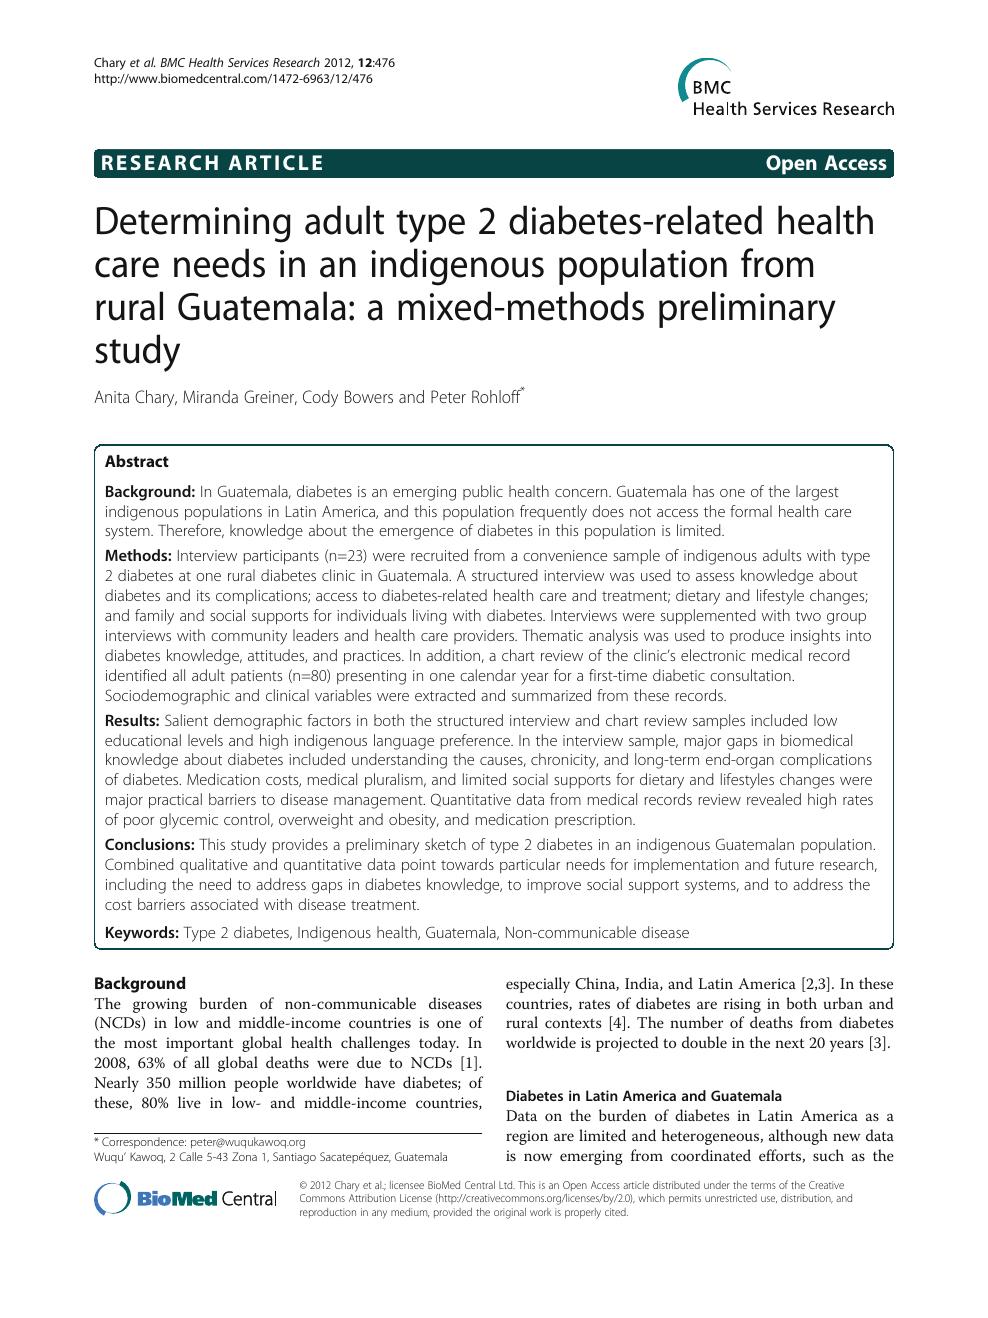 estadísticas de diabetes infantil texas